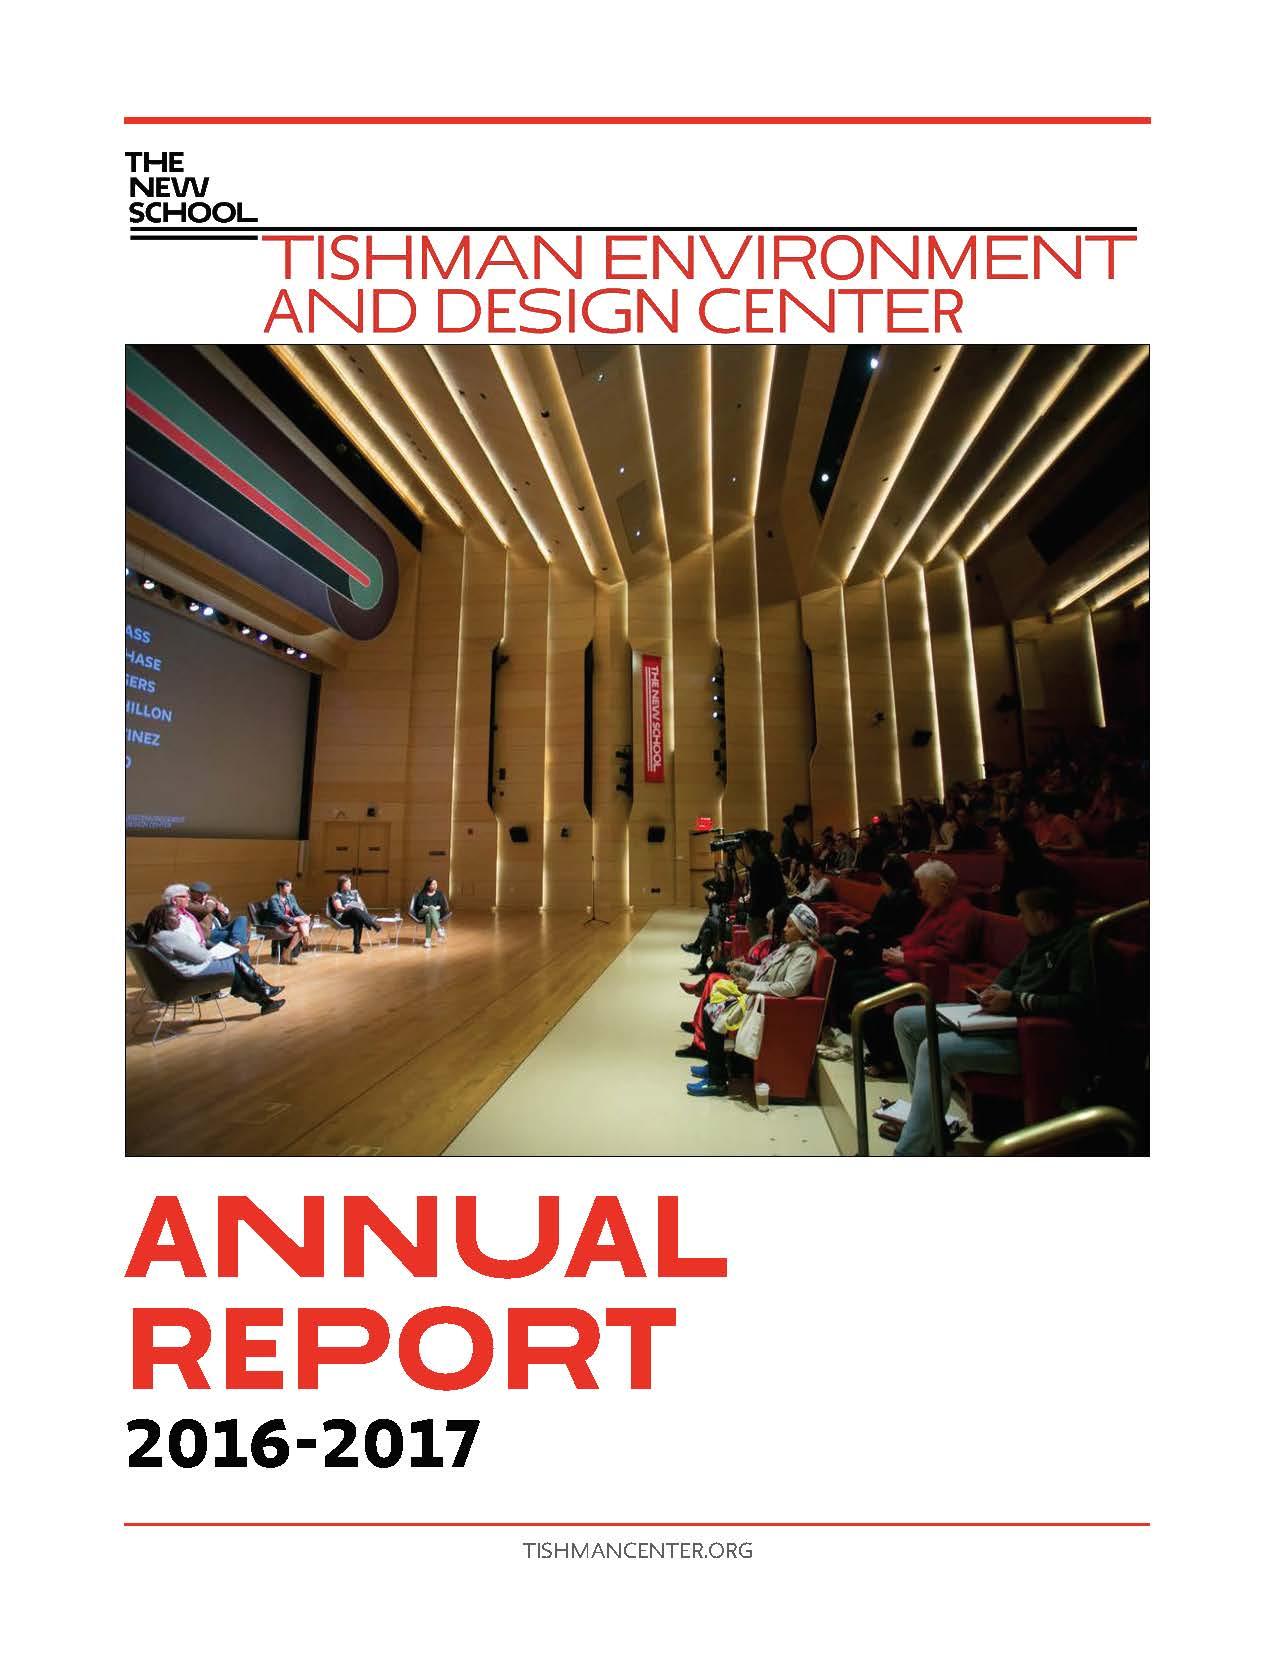 2016/2017 Annual Report -